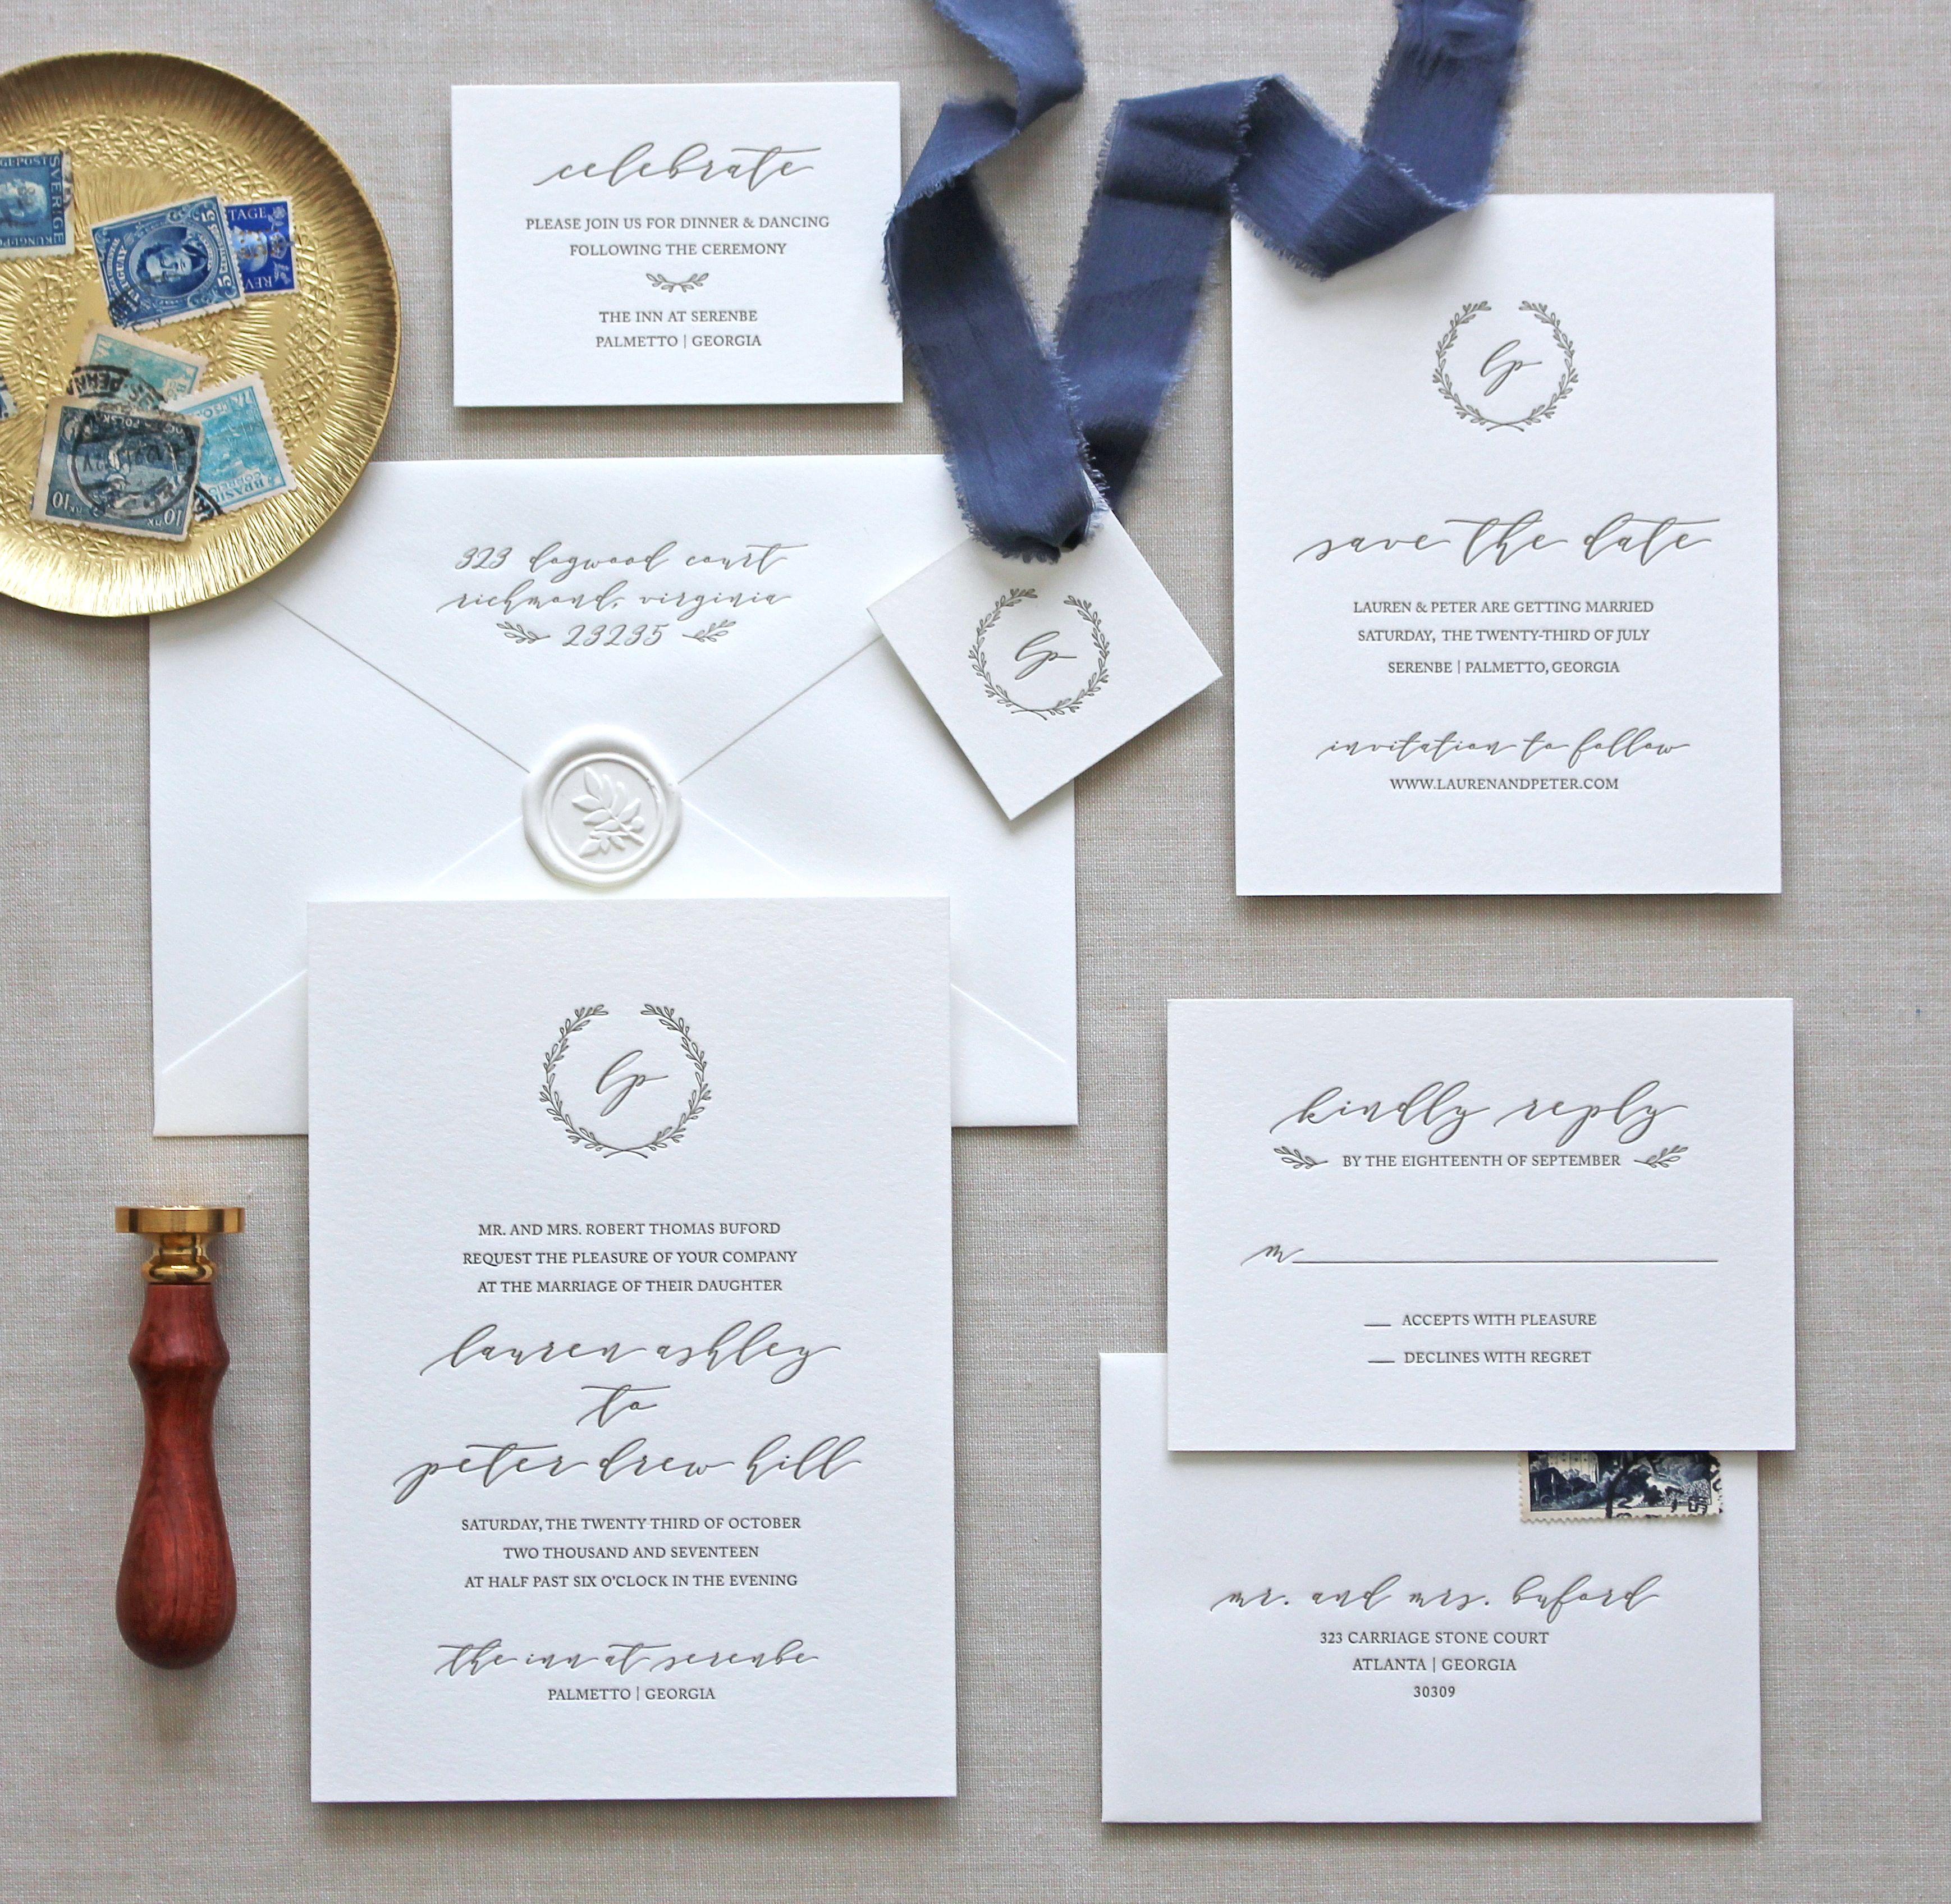 wedding invitations atlanta%0A Letterpress wedding invitations    Serenbe design    CHATHAM  u     CARON  letterpress studio   Letterpress